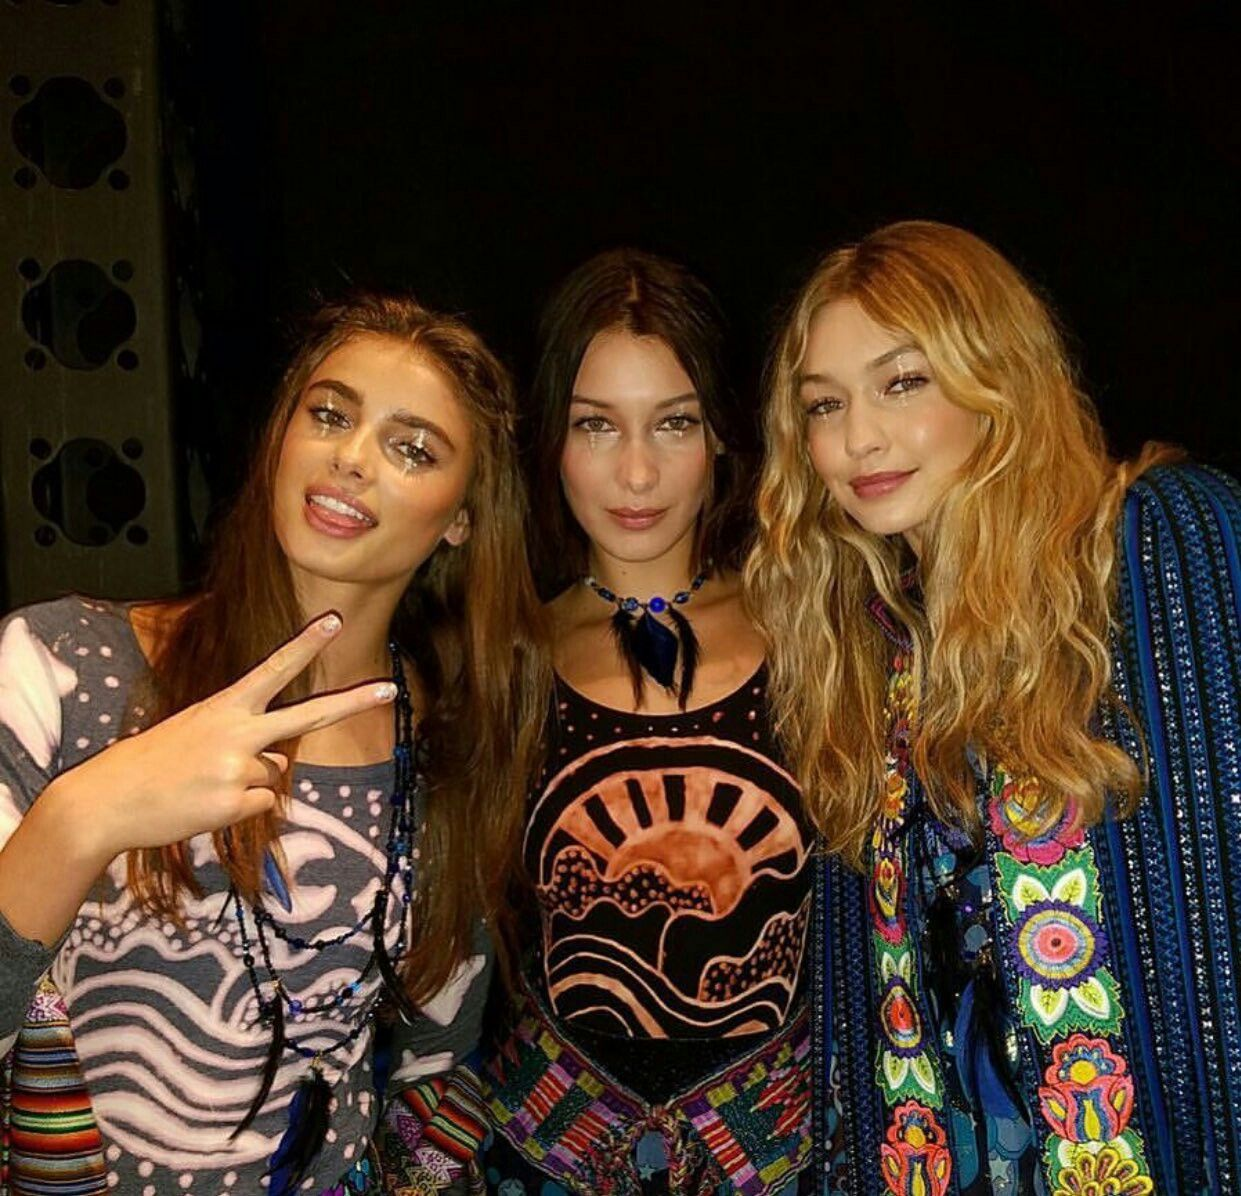 Gigi Hadid, Bella Hadid and Taylor Hill backstage at the ...